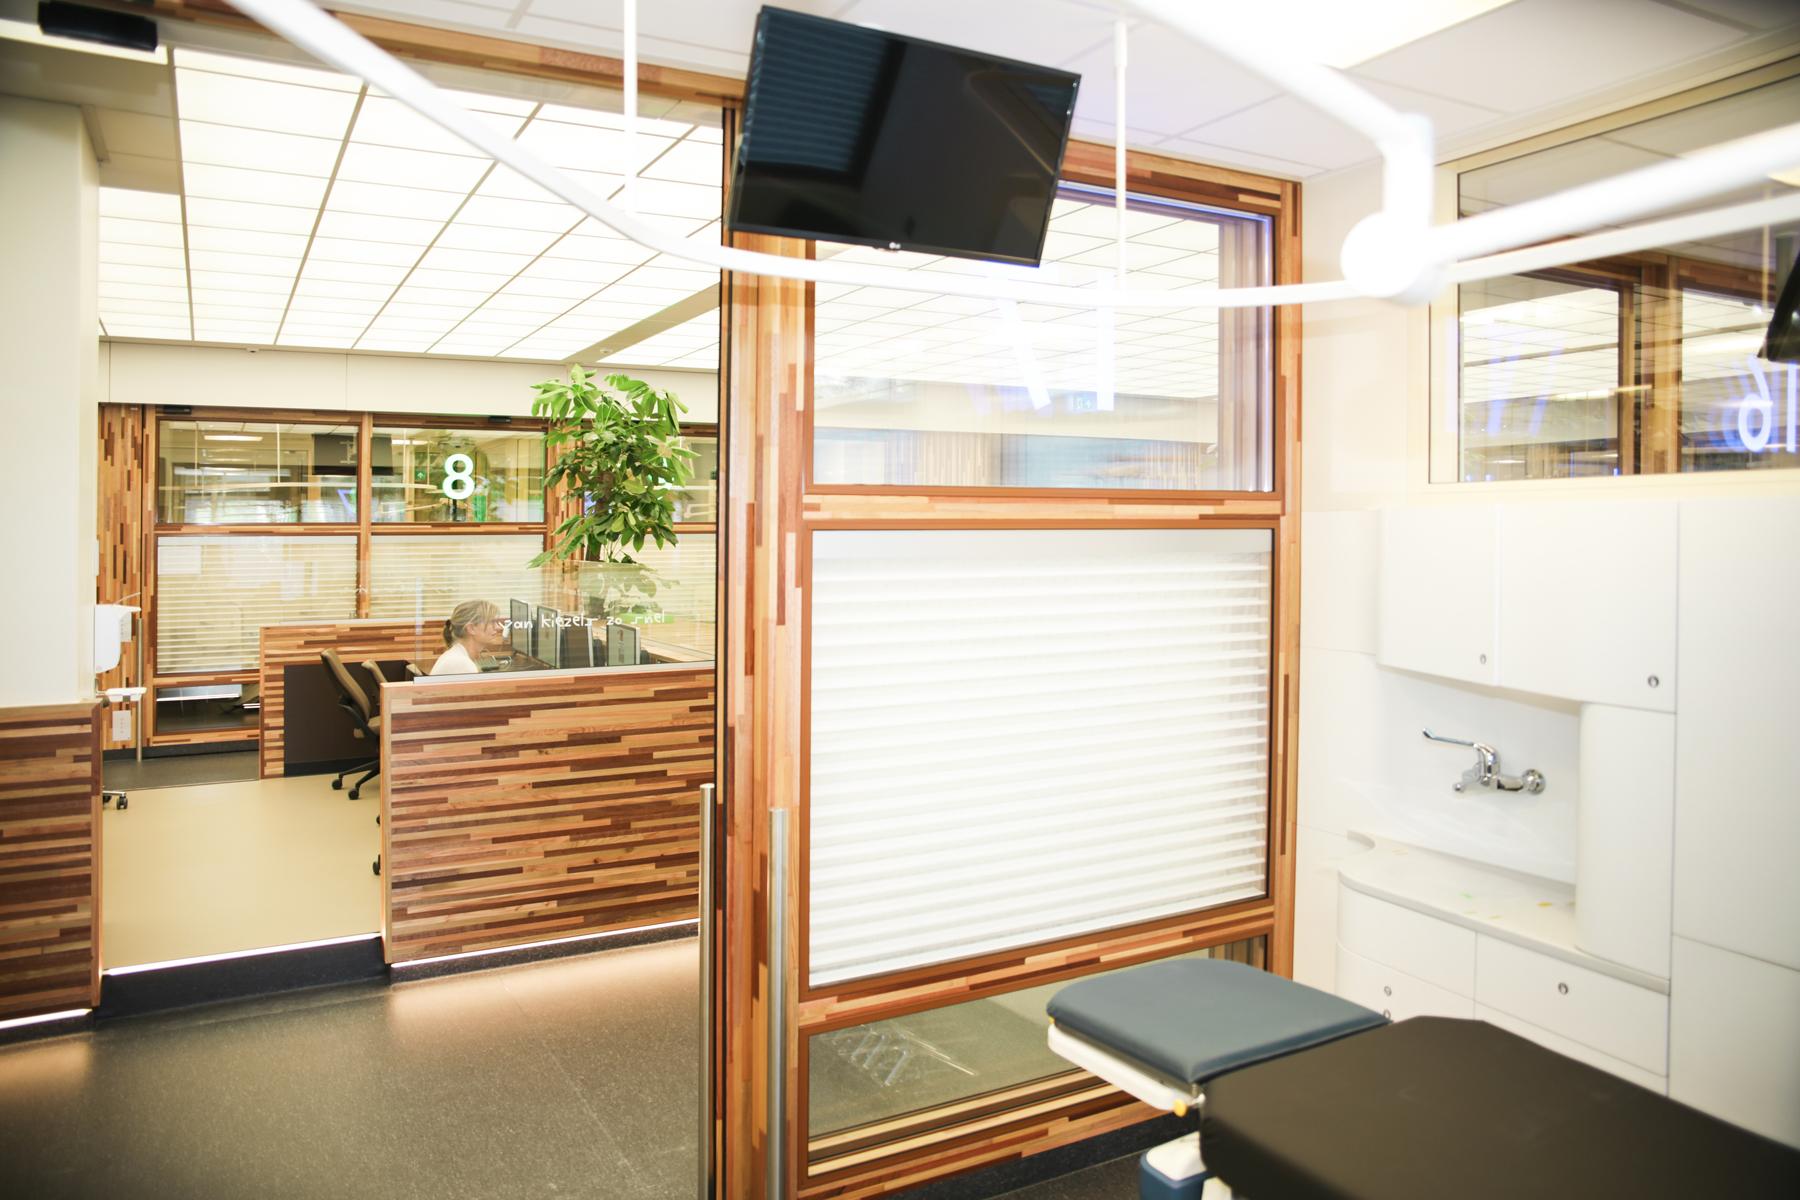 arc17 interieur amc spoedeisende hulp olivier spek architecten de architect. Black Bedroom Furniture Sets. Home Design Ideas